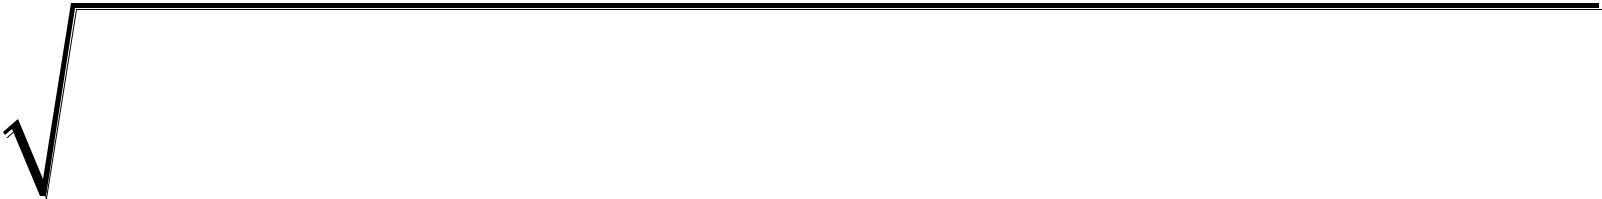 hello_html_4b6e33e6.jpg